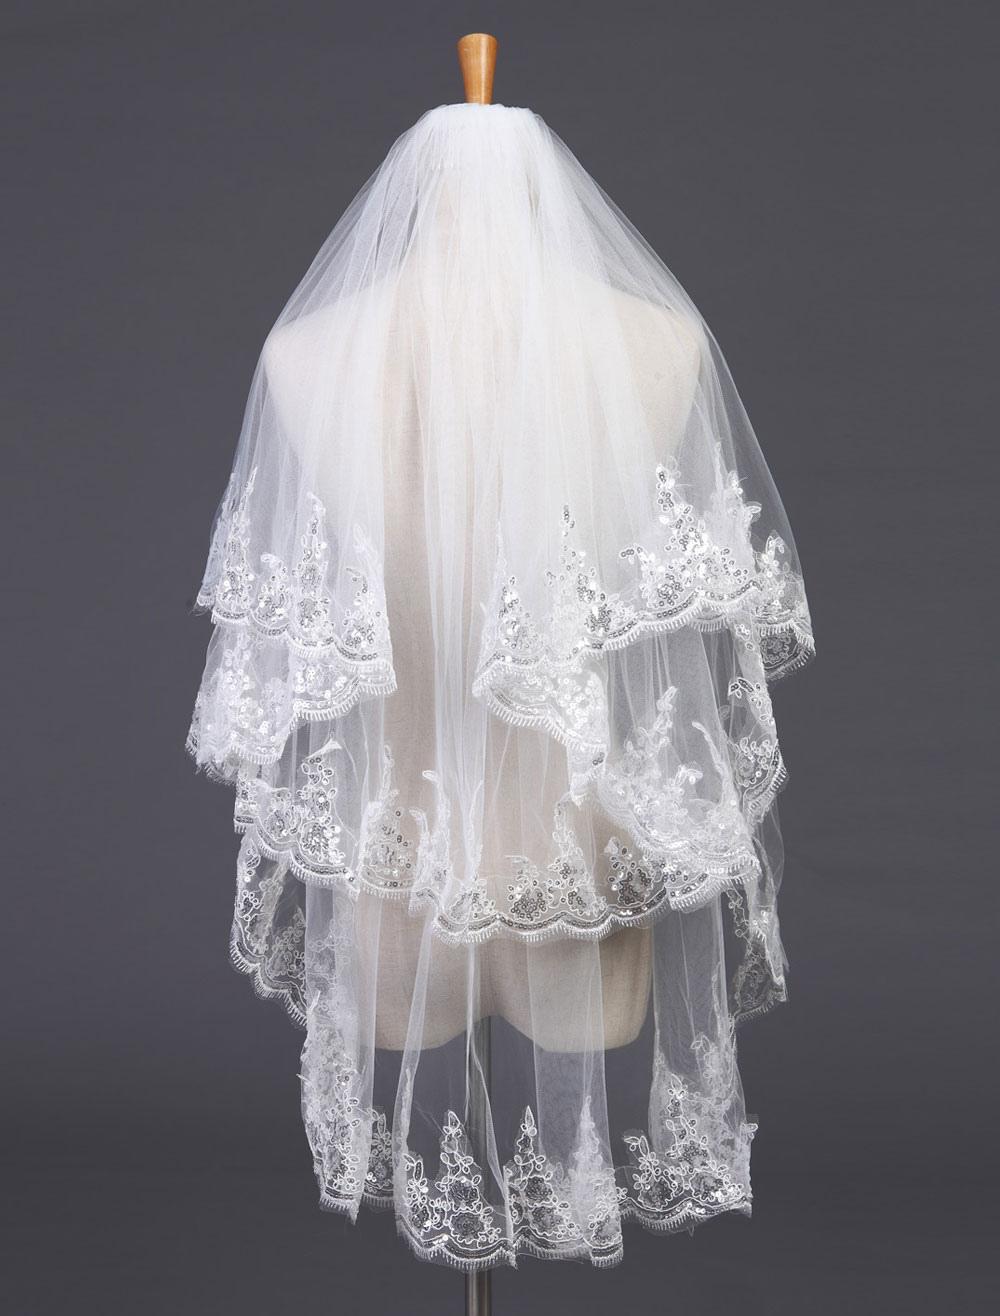 Two-Tier Wedding Veil Tulle Lace Applique Edge Bridla Veil With Comb